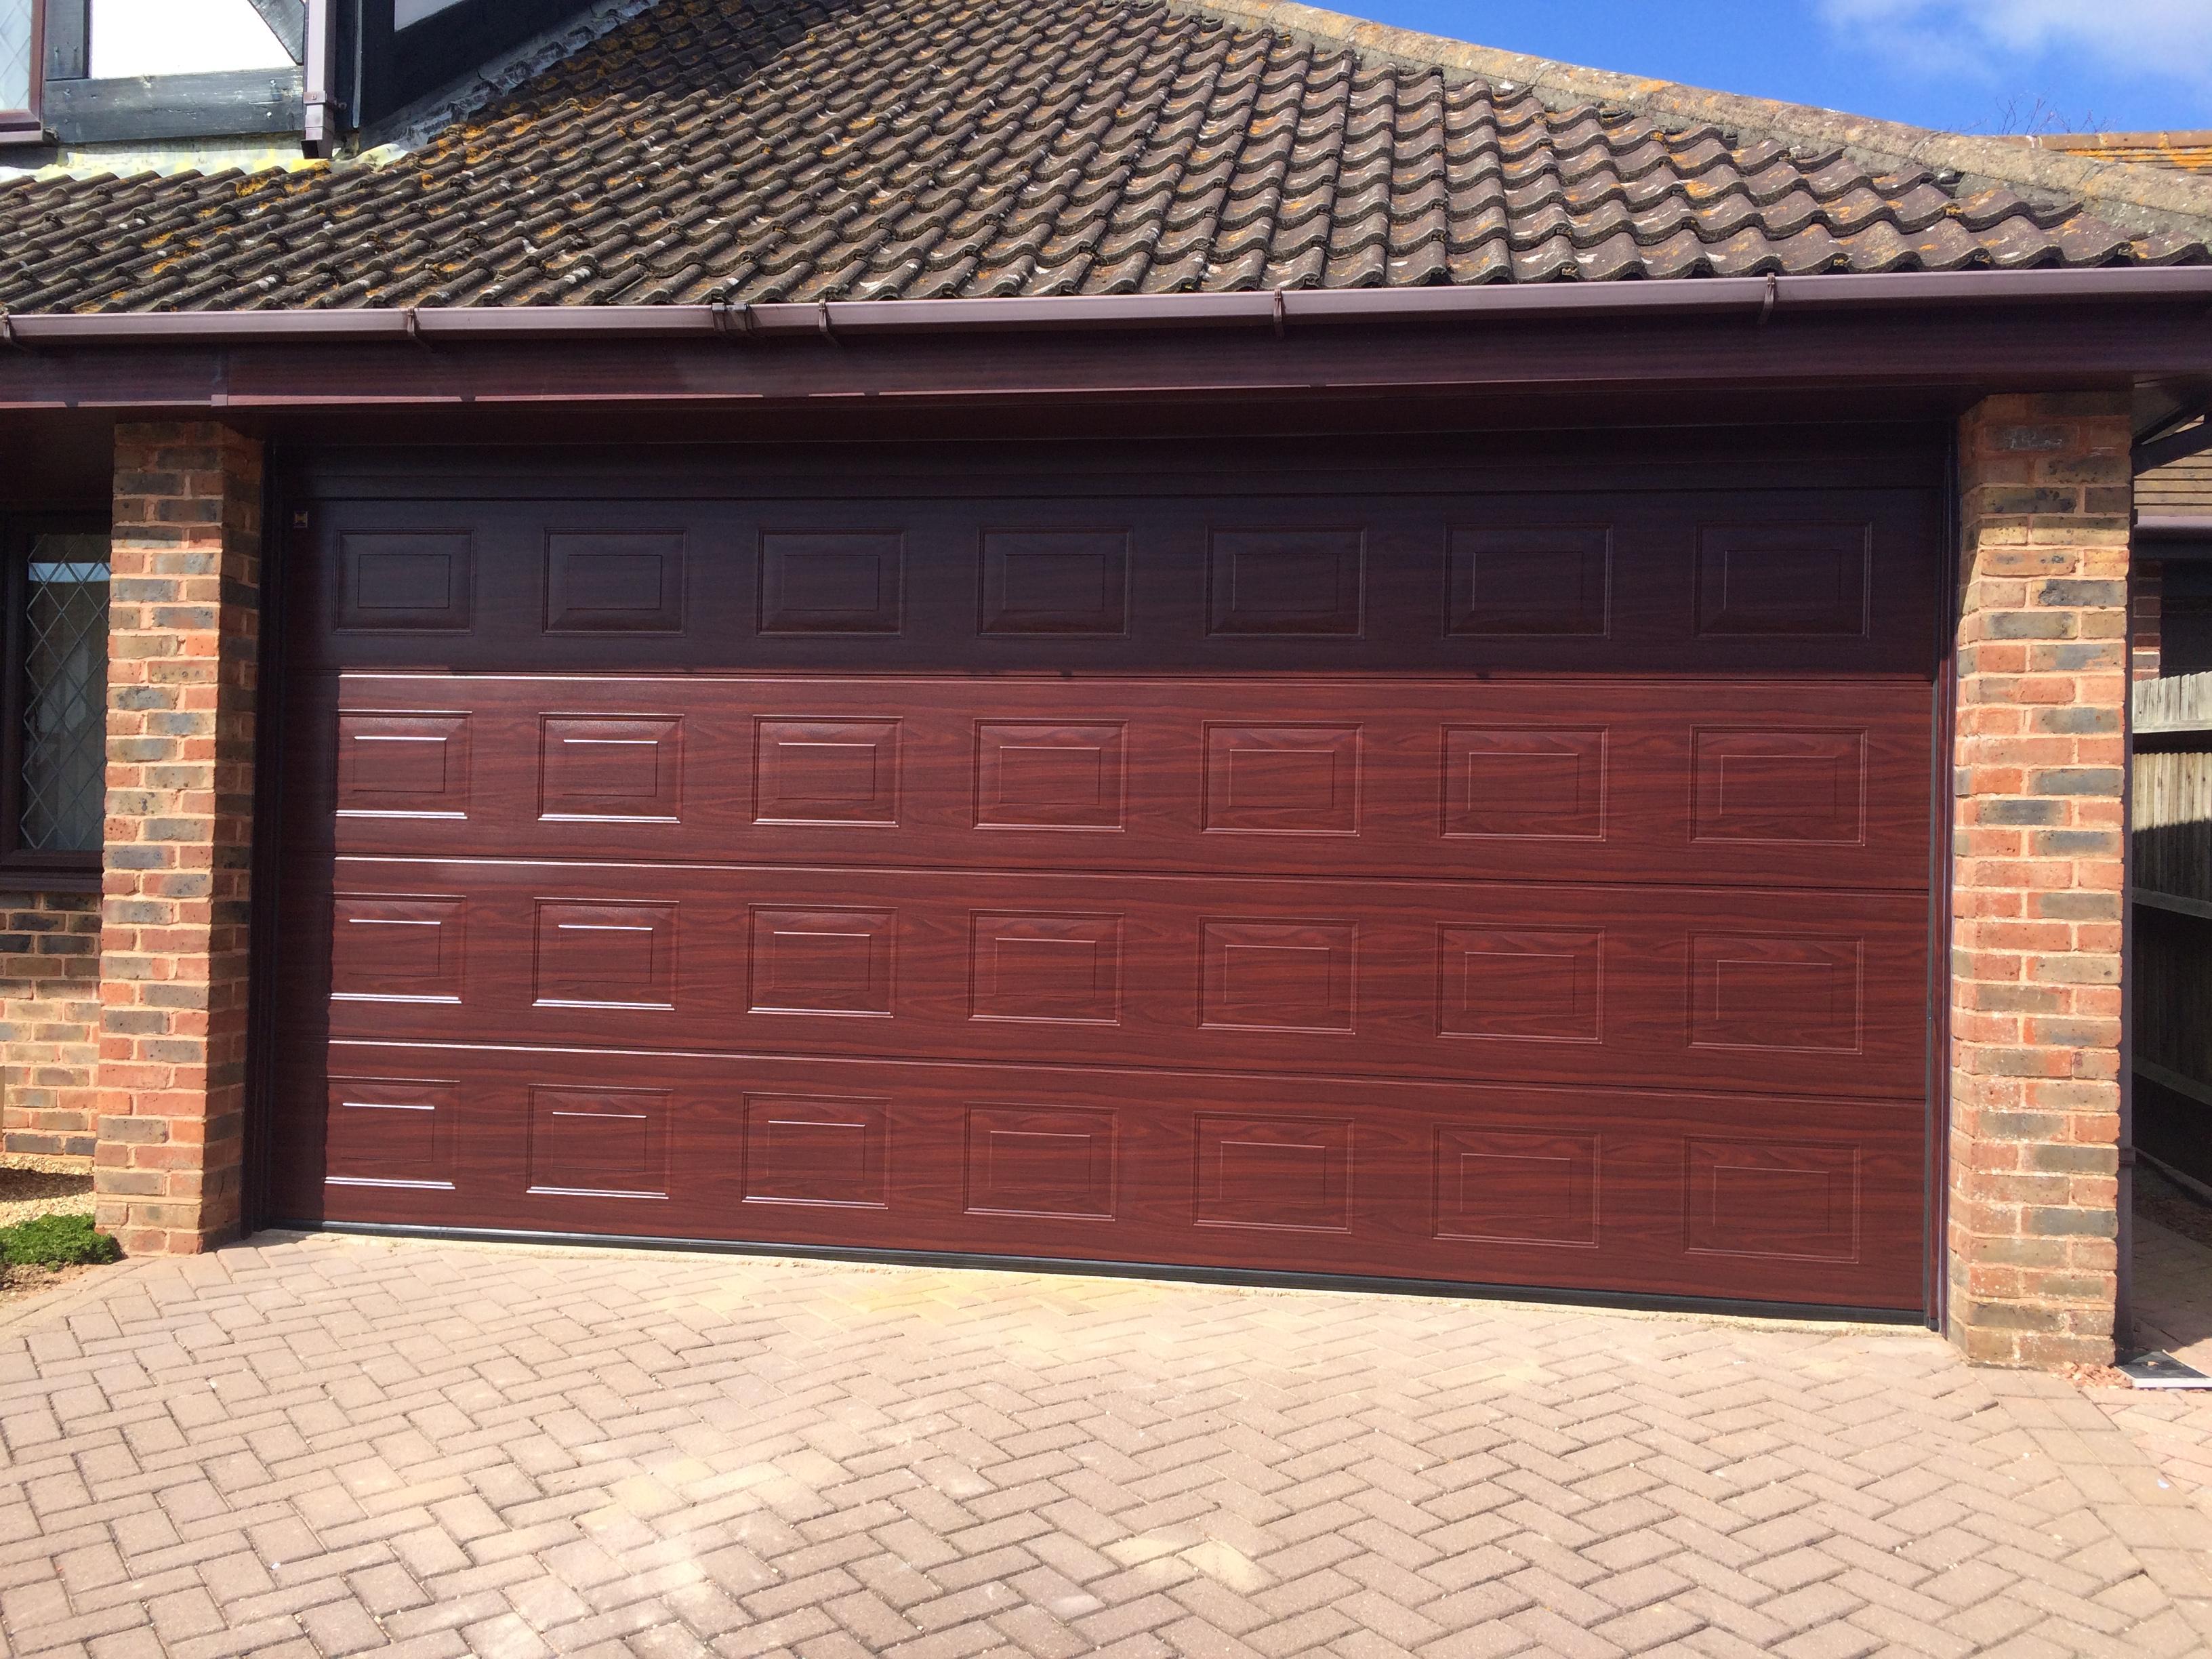 doors replacement garage ideas springs pricegarage full comes repair garageoor size brighton spring coil depot door torsion of home with kit